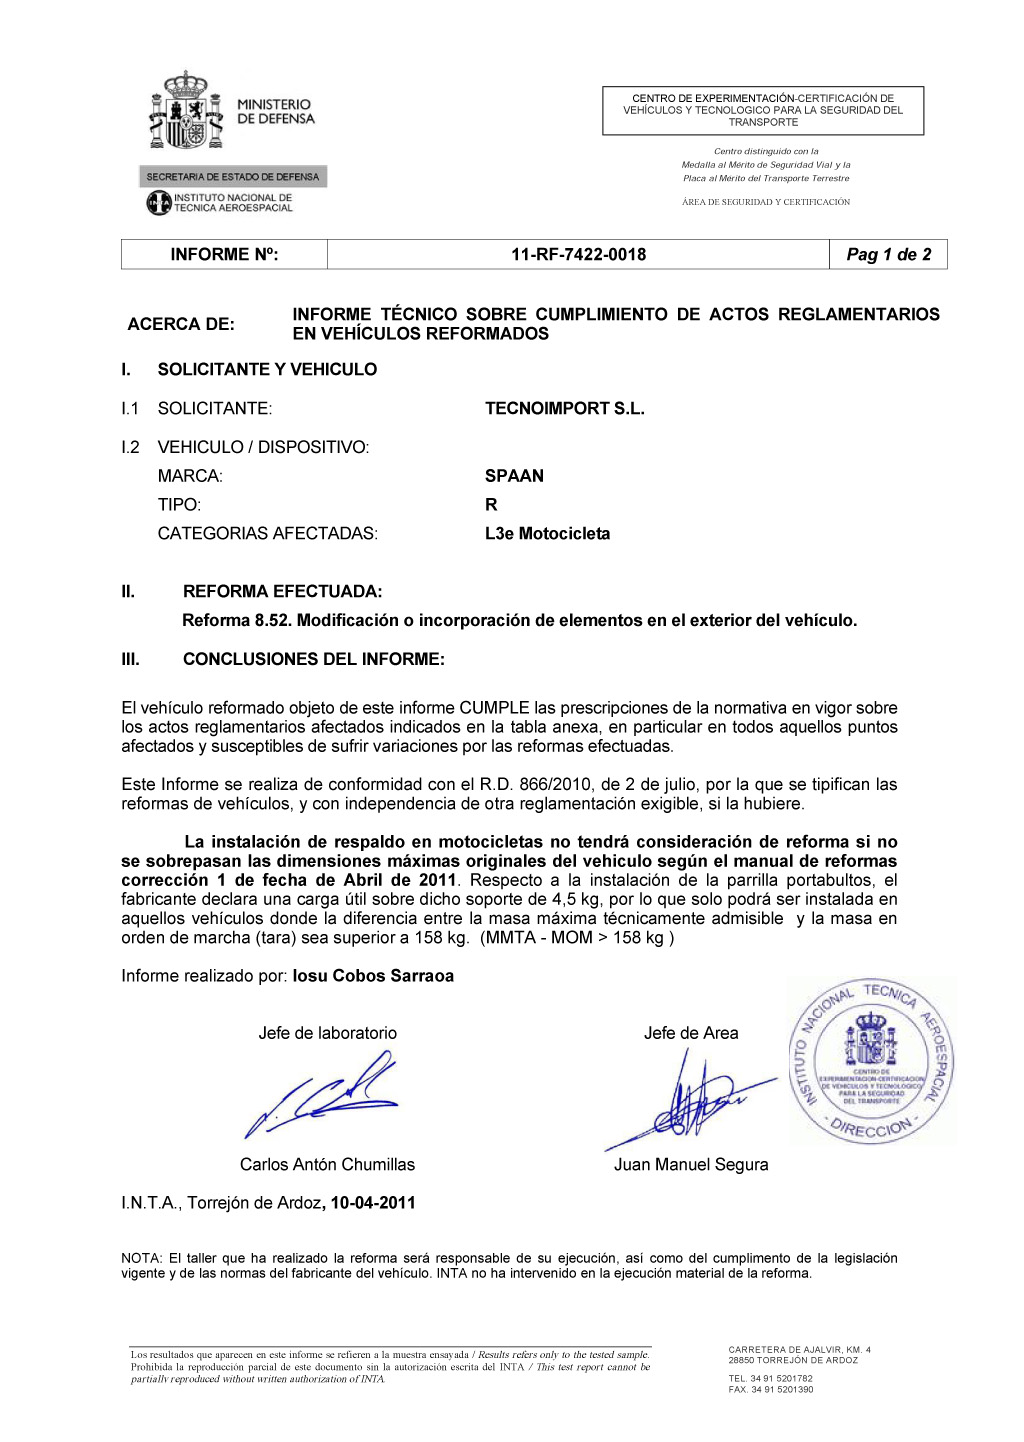 Сертификат INTA на спинки пассажира с багажникомSPAAN для мотоциклов